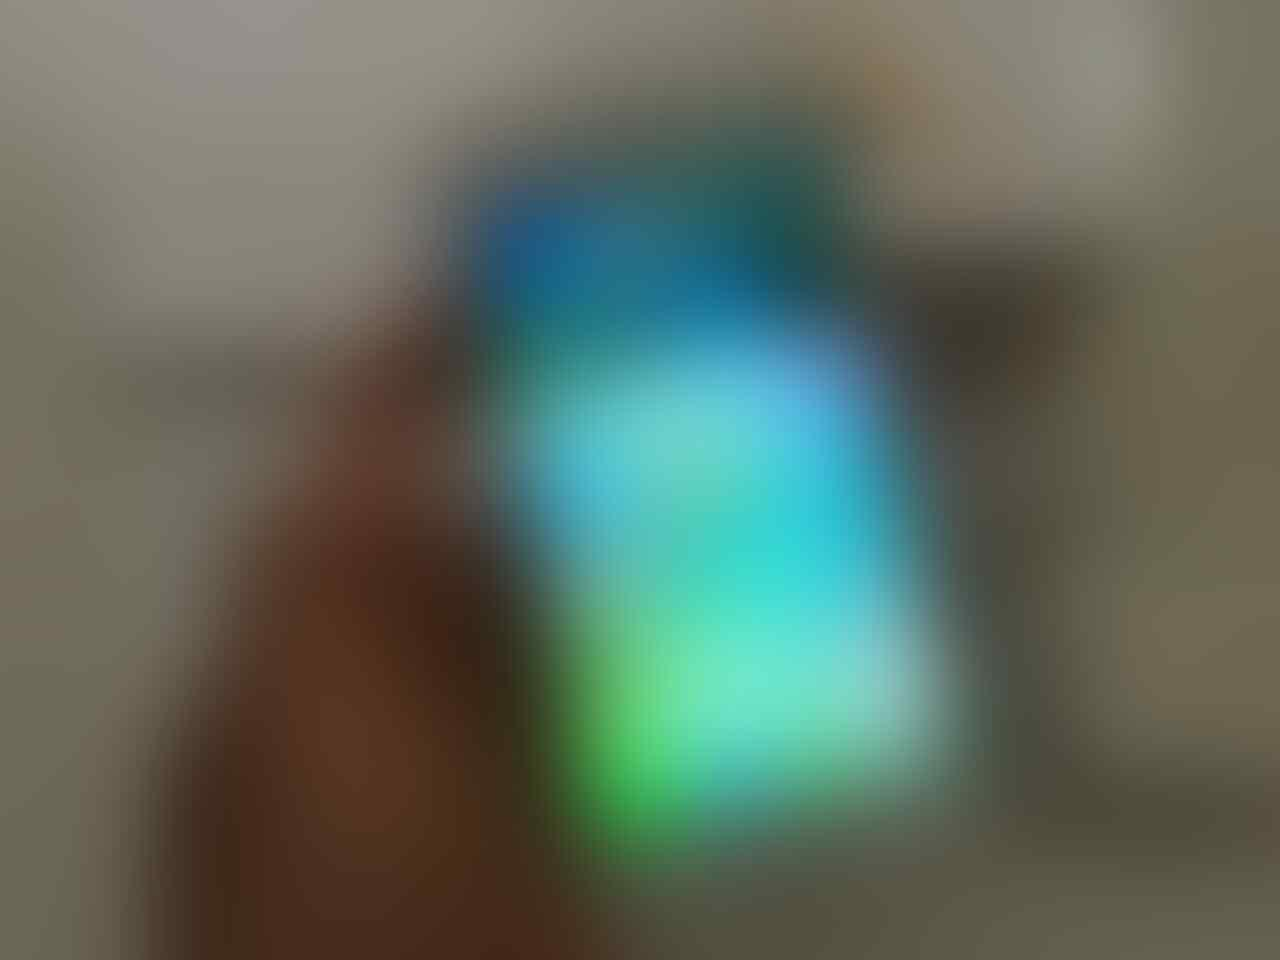 IPHONE 6S GOLD 16GB IOS 10 FULLSET MULUUUSS NORMAL MURAAHH 3300 SAJA [MALANG]